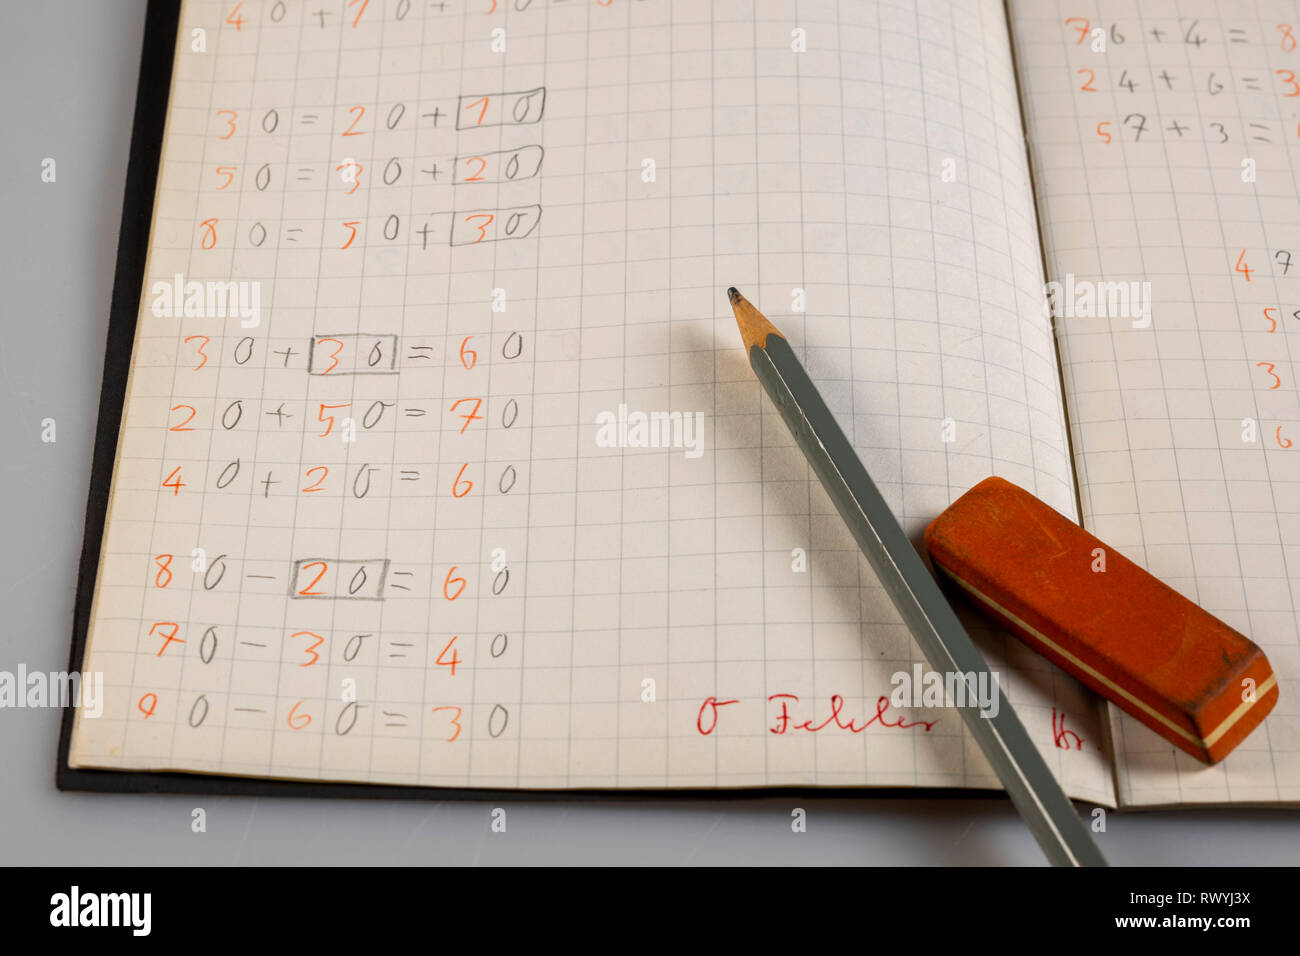 Exercise book, elementary school, arithmetical problems, mathematics, basic operations, correction, - Stock Image